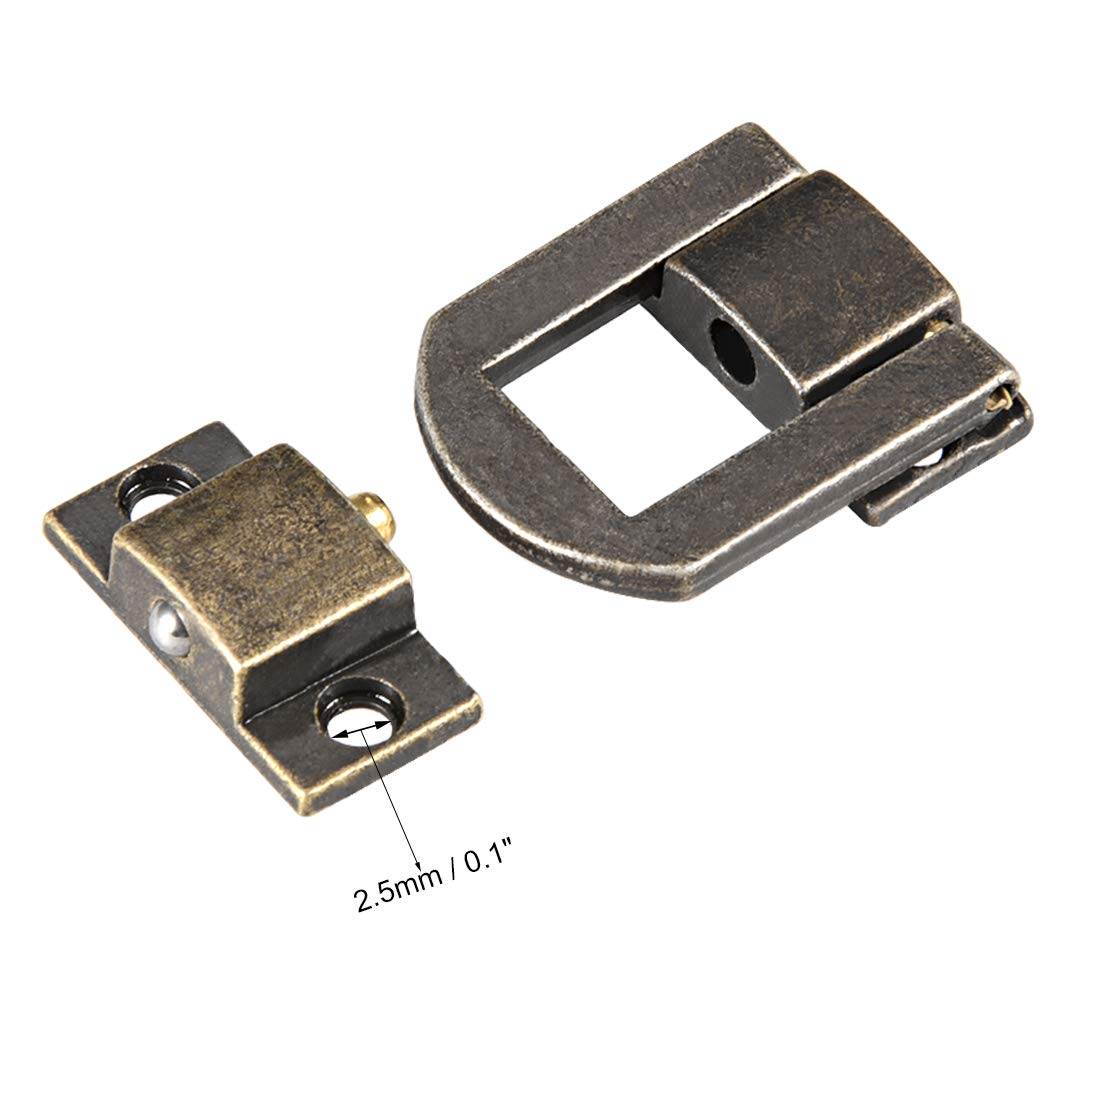 sourcing map 4stk Dekorative Haspe Schmucksbox mit Schrauben 25mm Bronzen DE de Umschaltenschloss